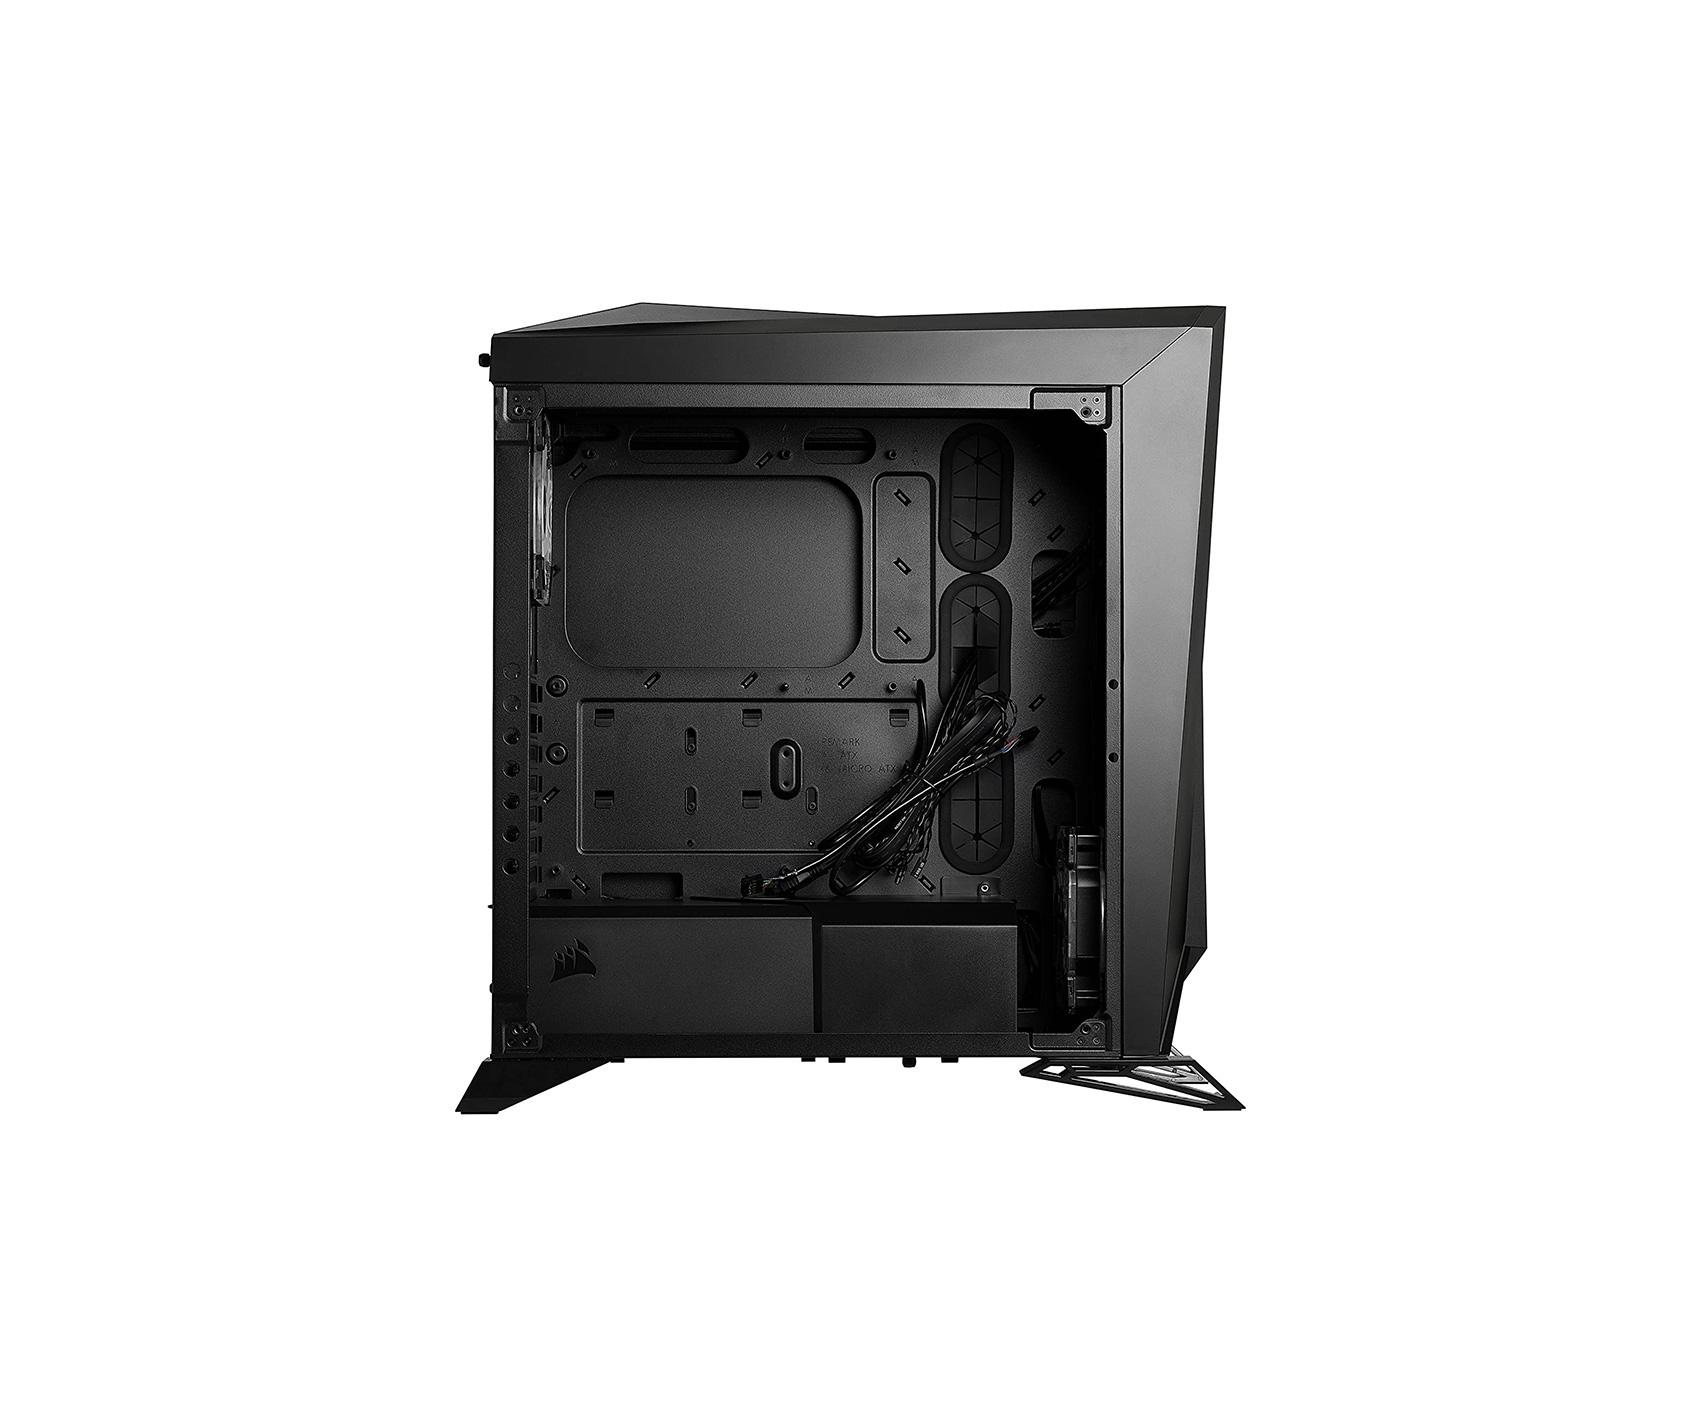 Corsair Carbide Series SPEC-OMEGA RGB Tempered Glass case